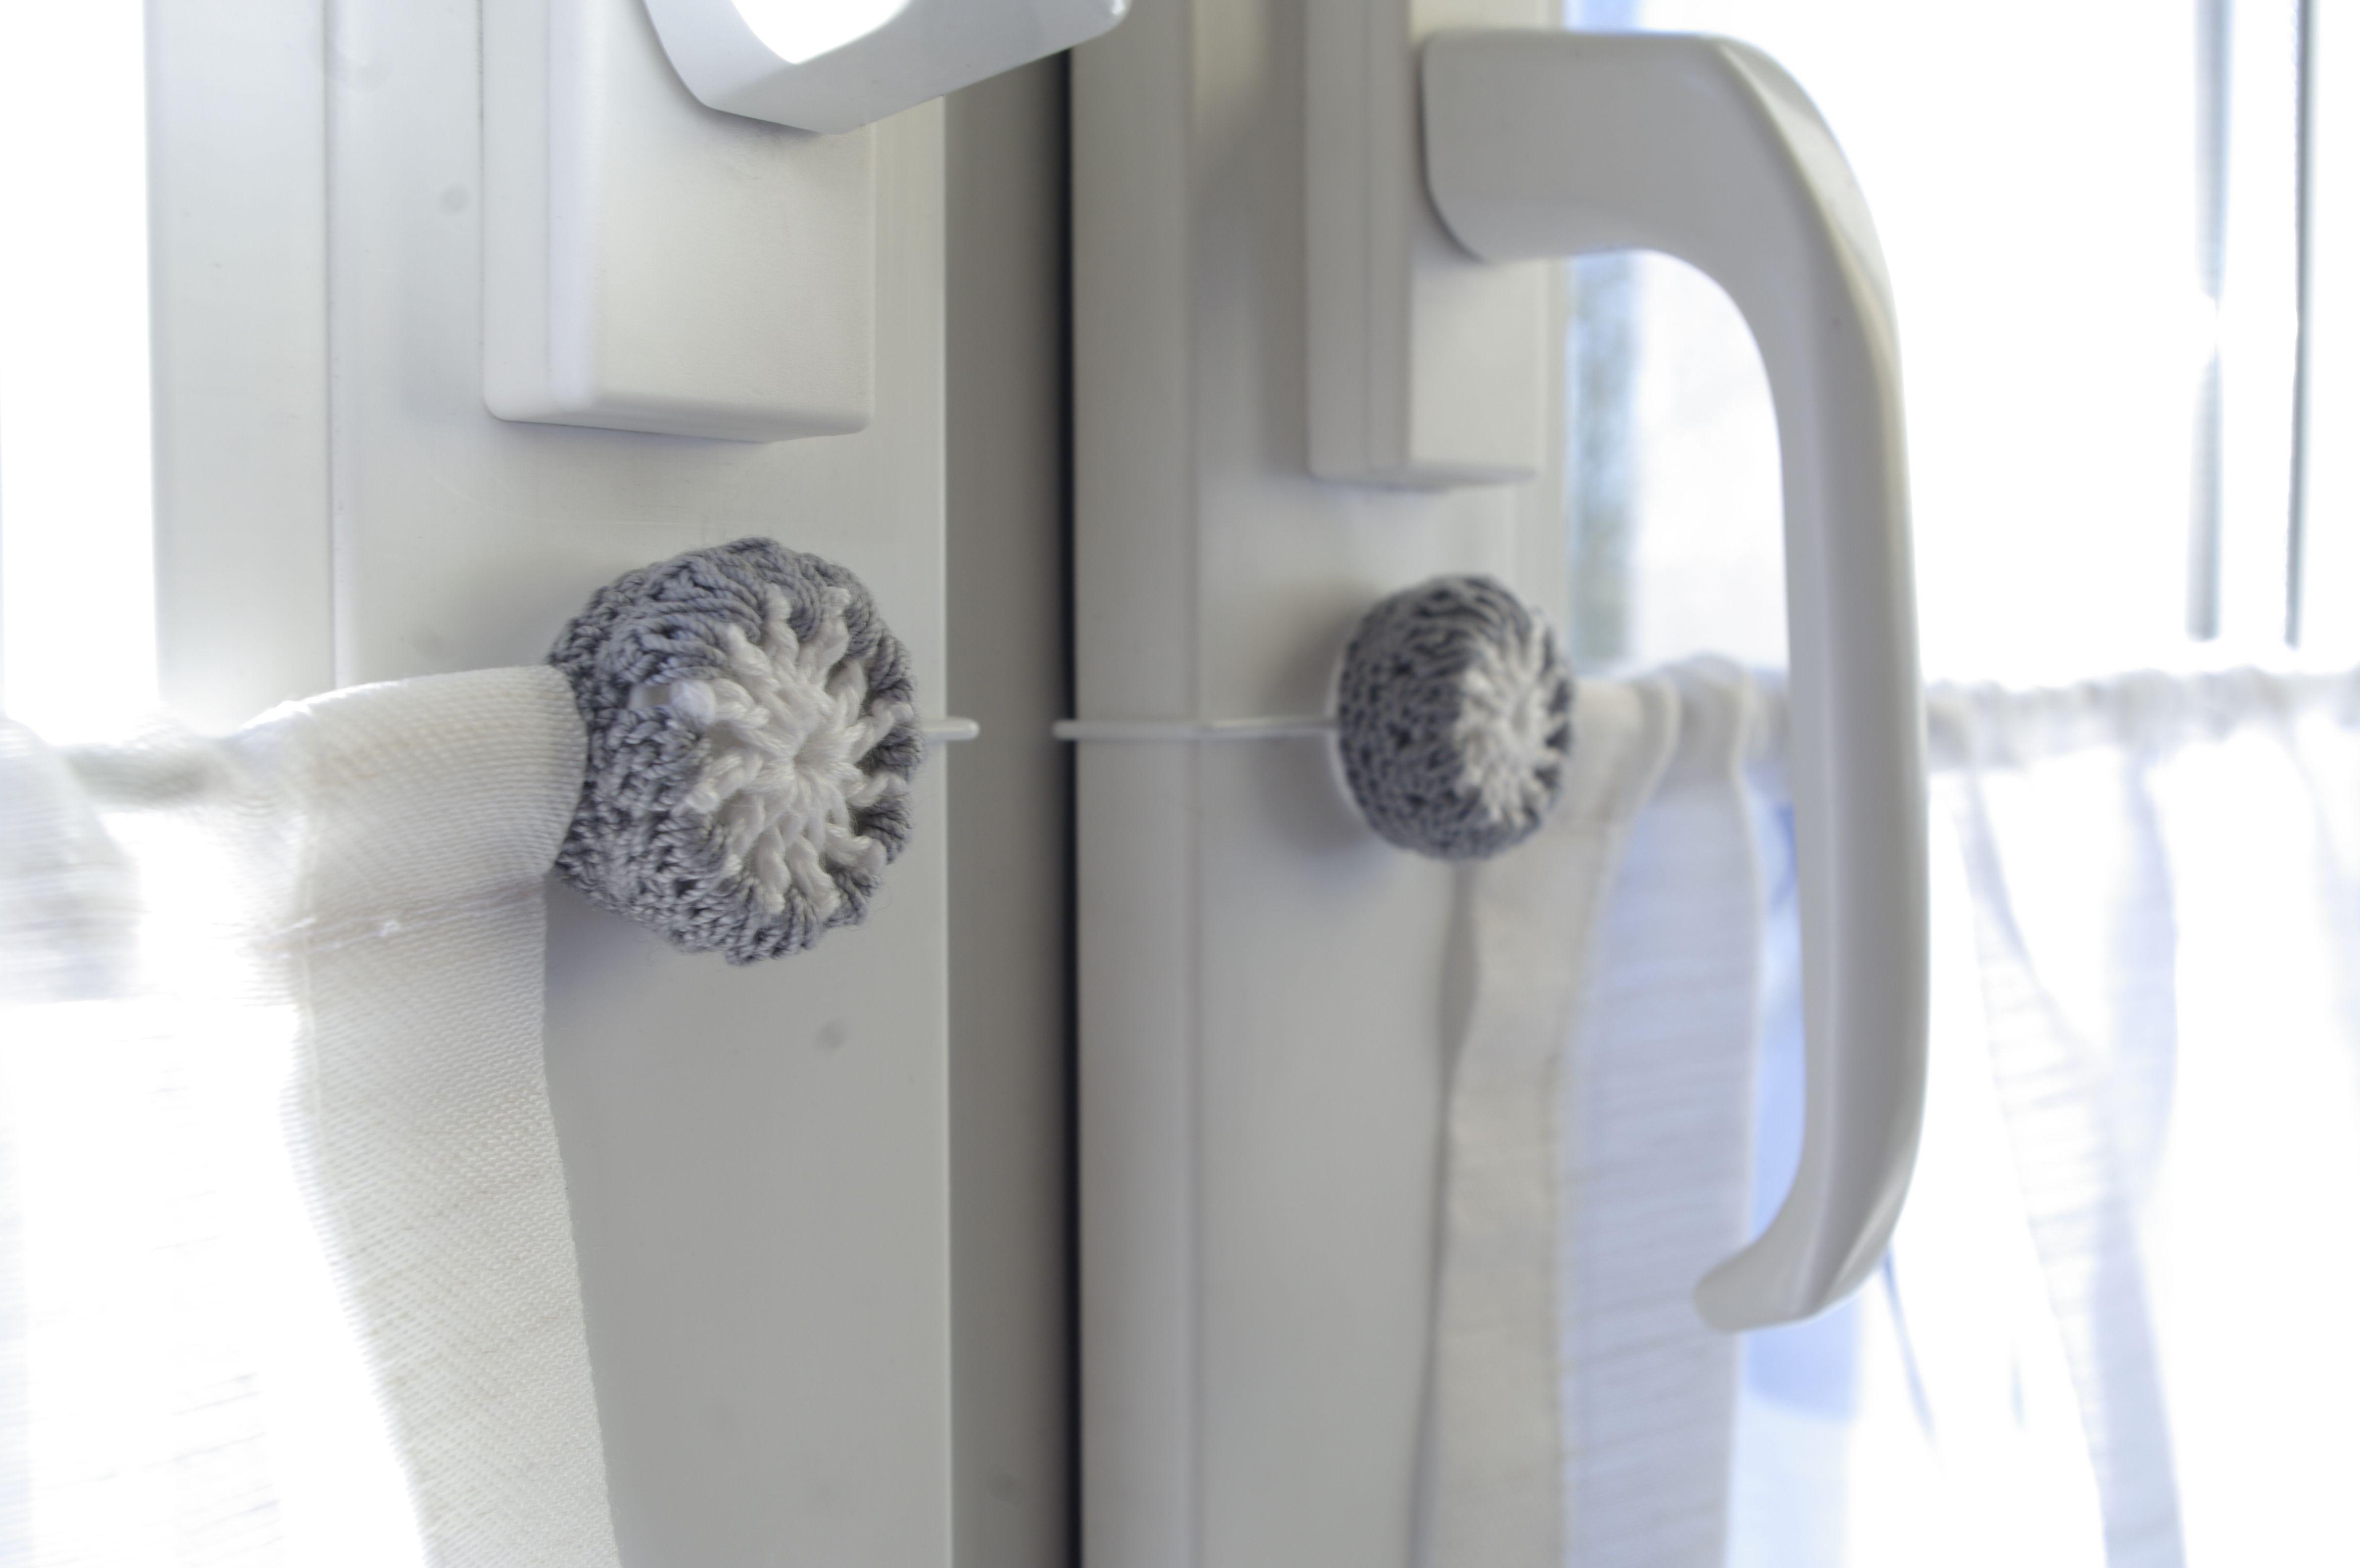 Inspirierend Kuechengardinen Ikea Design